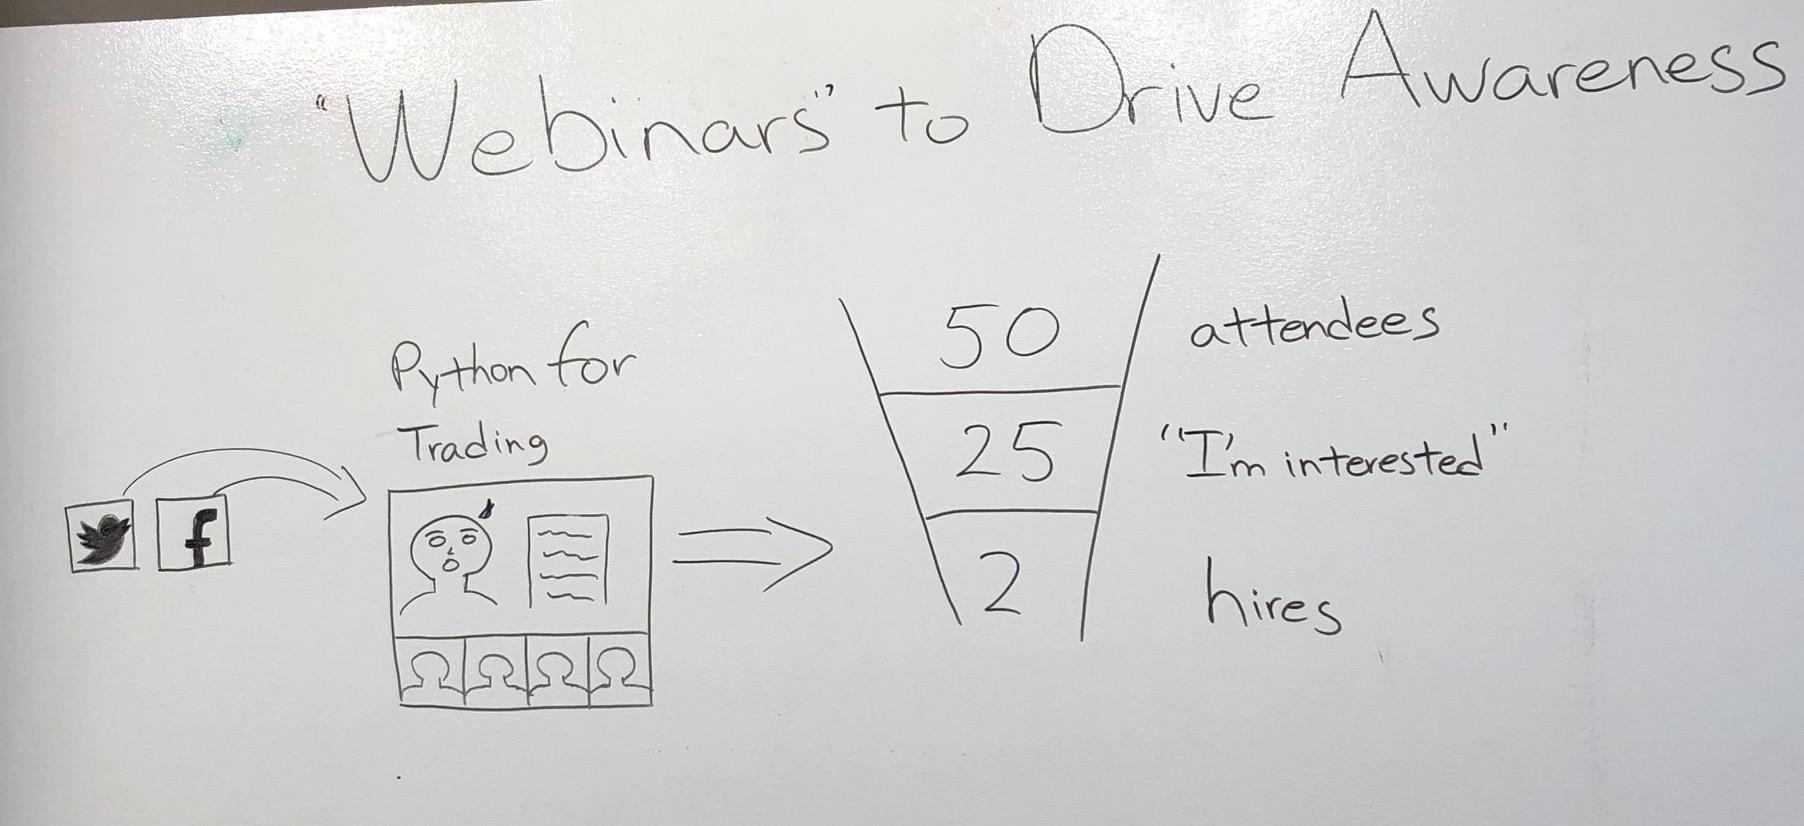 Using Webinars to Drive Awareness of Your Employer Brand